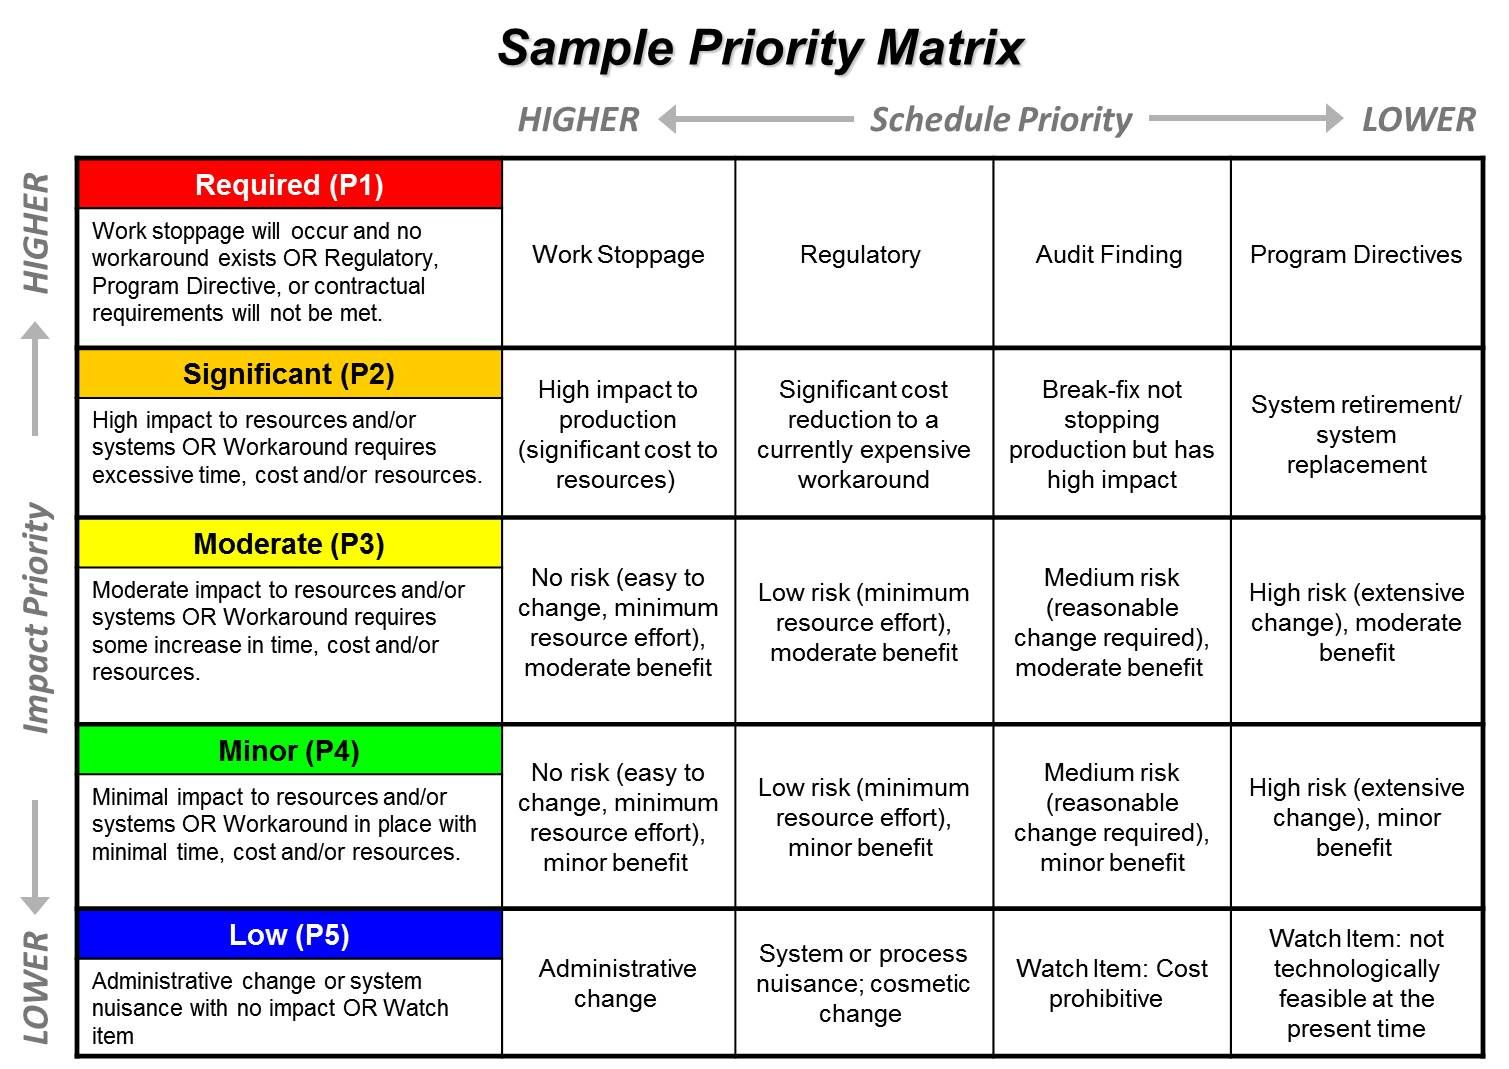 Esample Priority Matrix Personal Development Plan Template